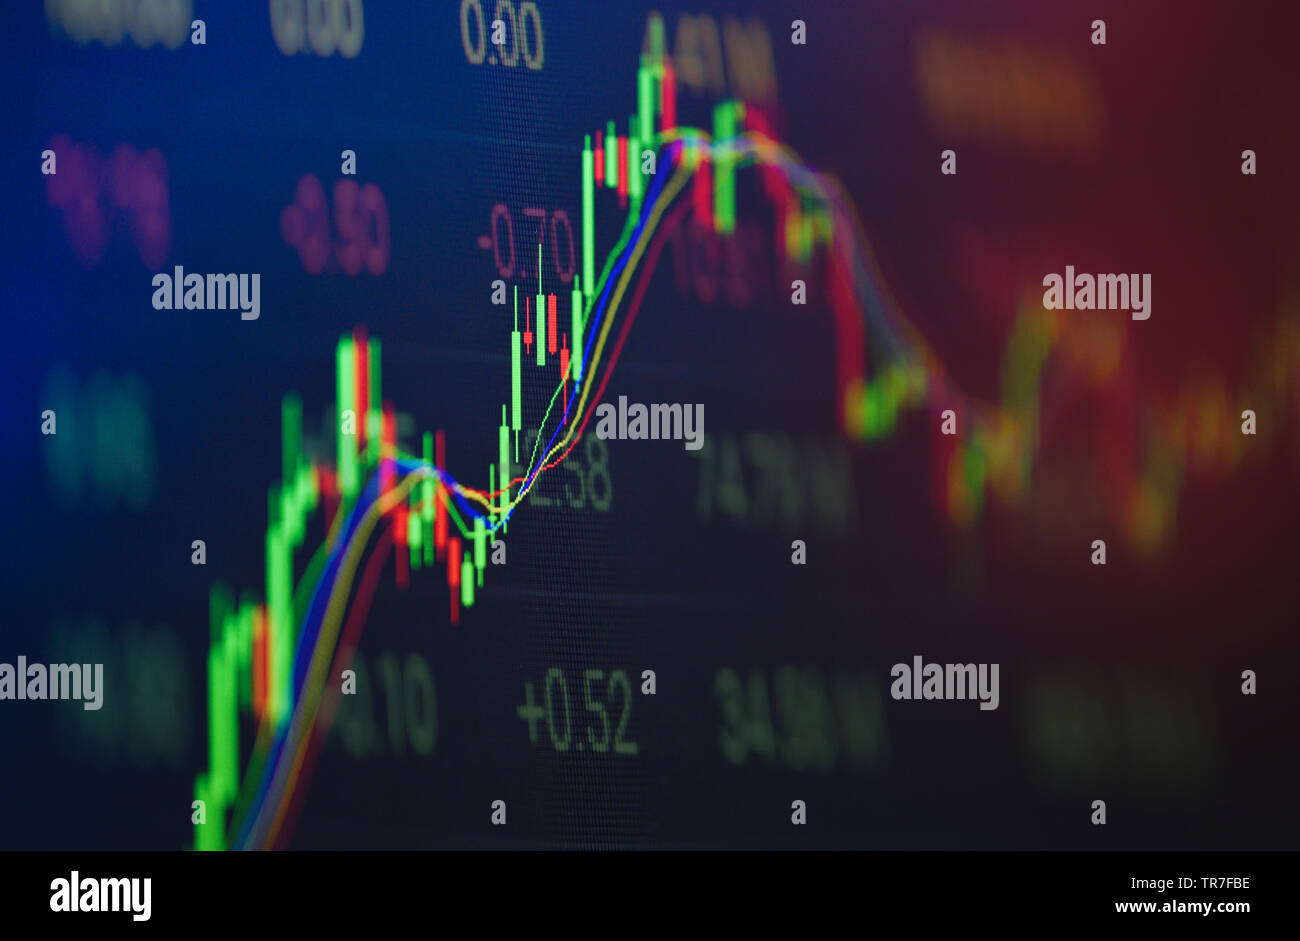 stock exchange market or